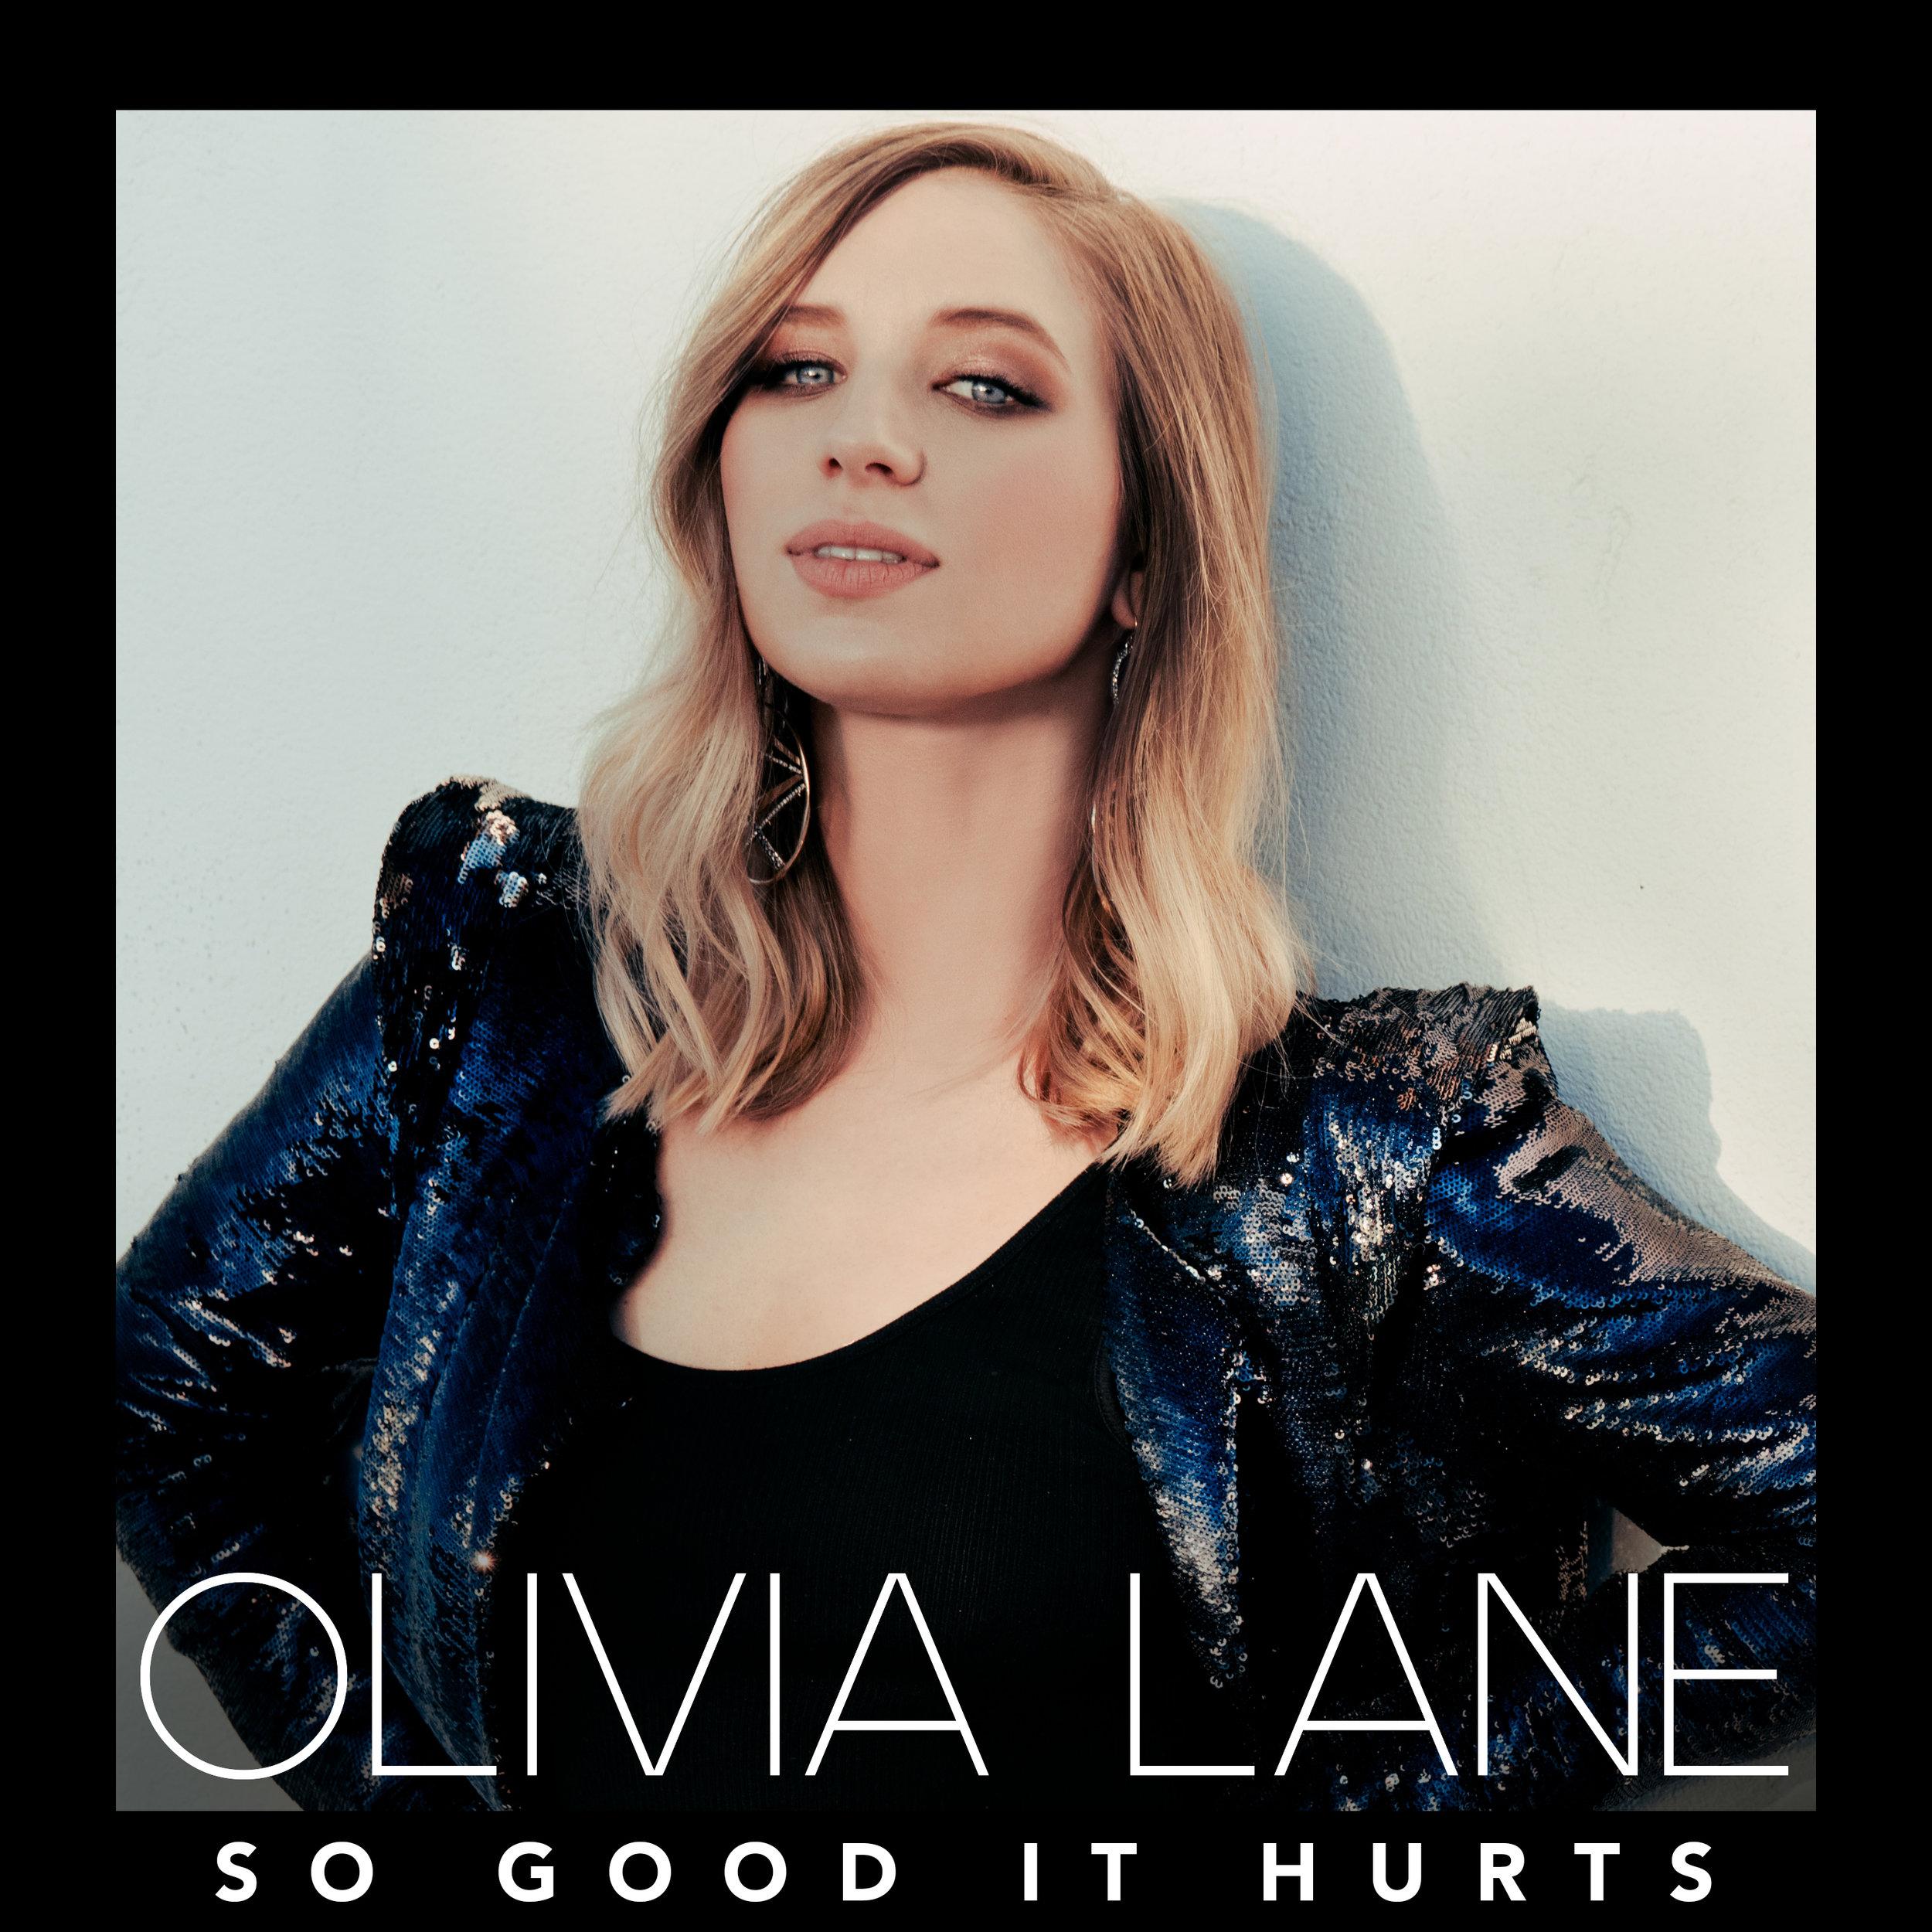 SGIH Olivia Lane Final Cover - 3000x3000 (1).jpg